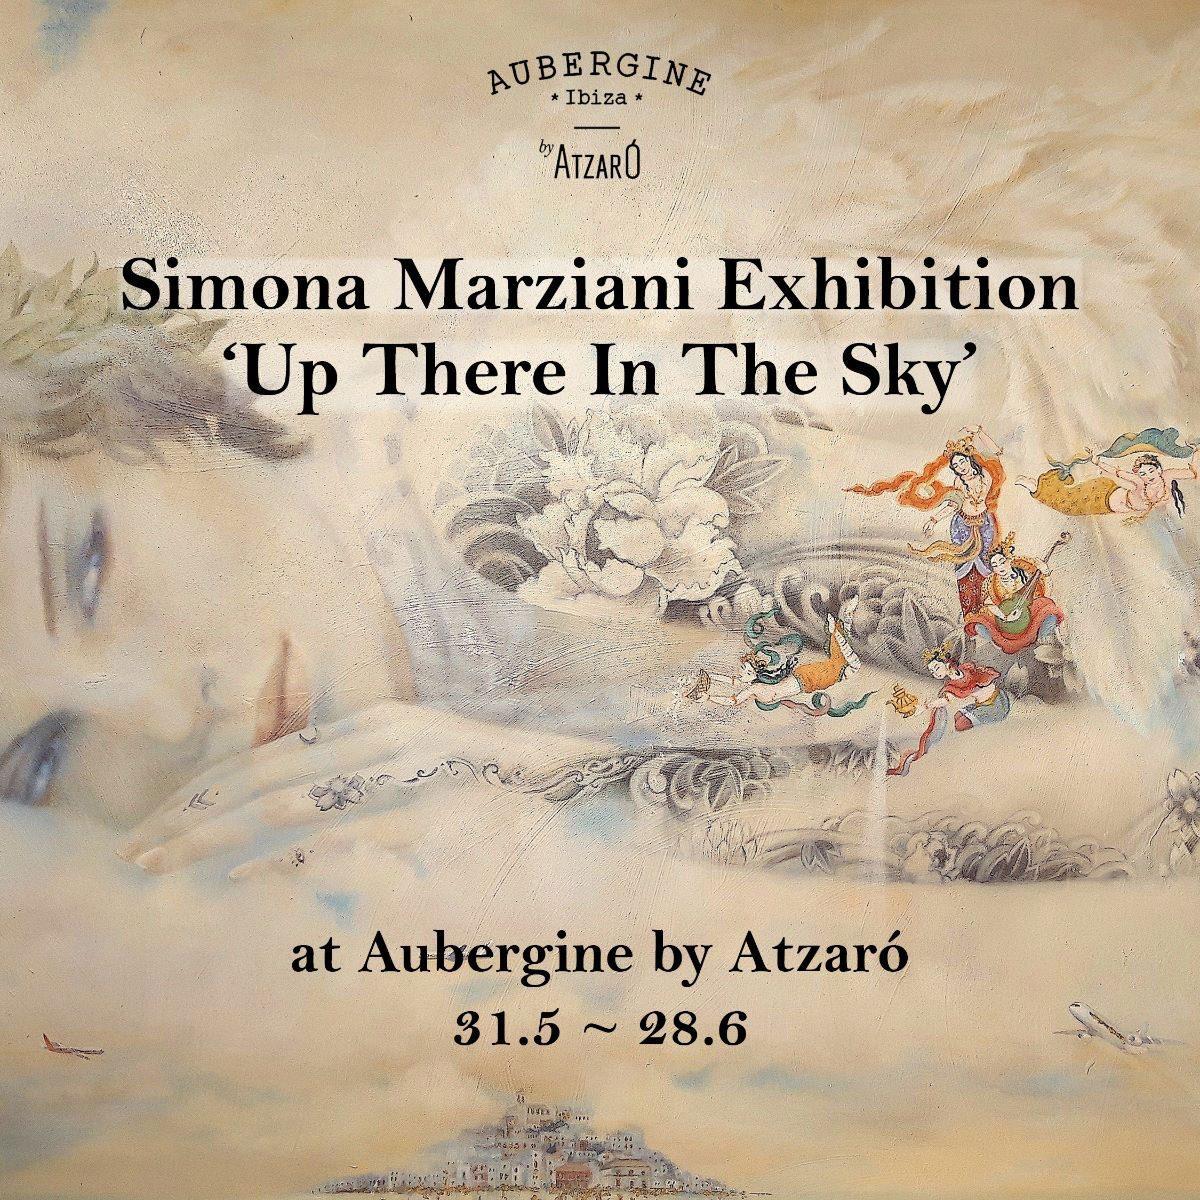 exhibition-simona-marziani-aubergine-ibiza-2020-welcometoibiza